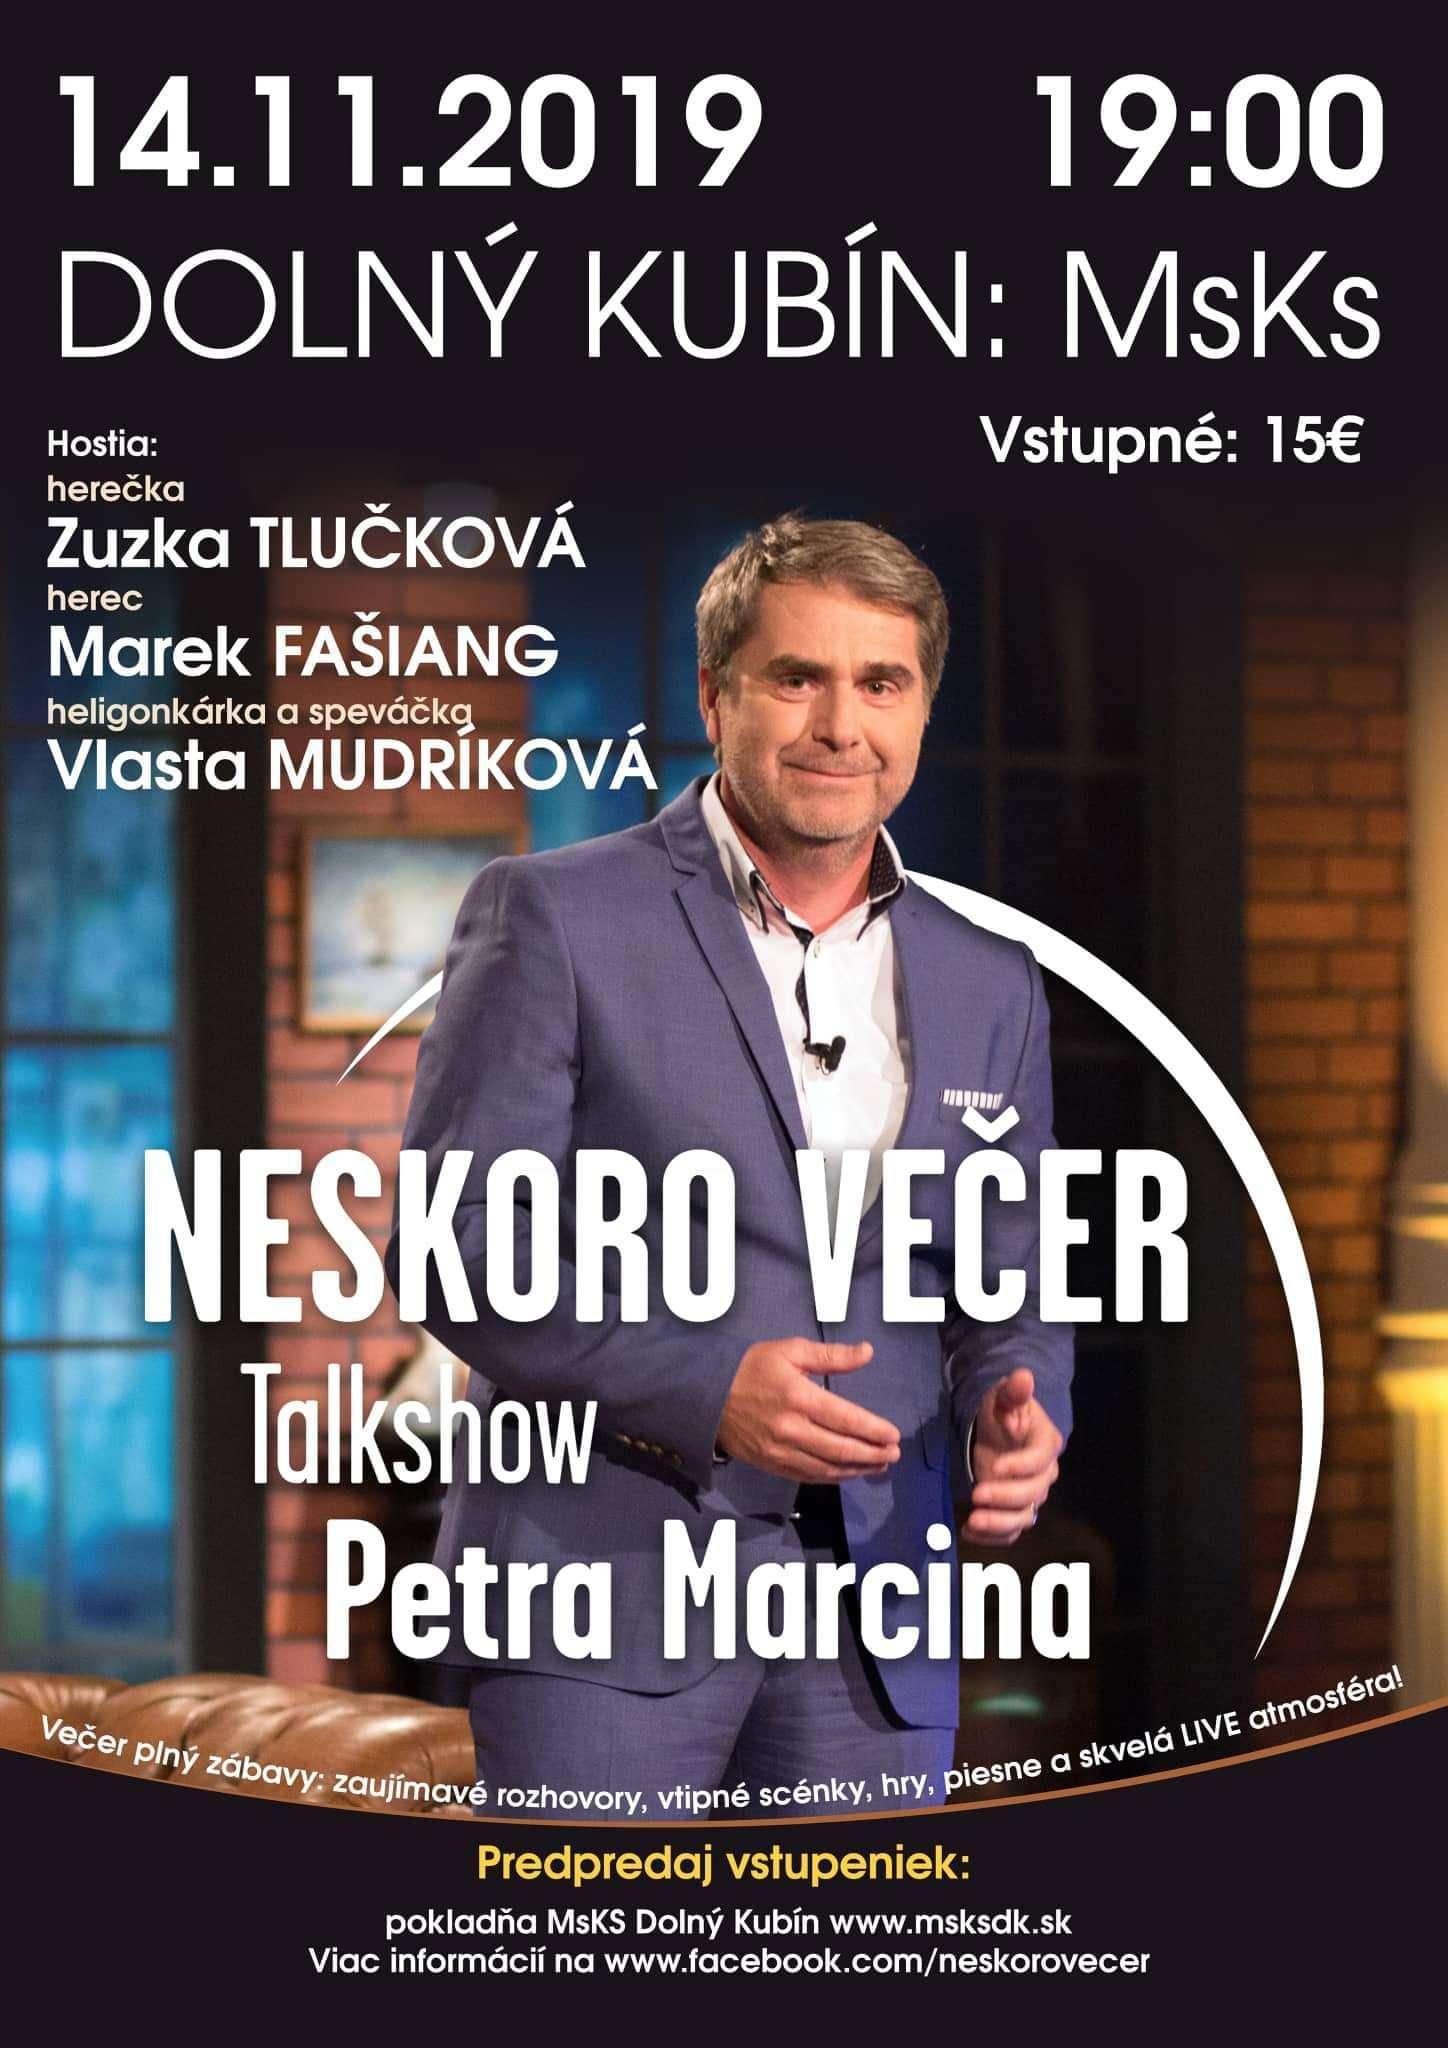 Dolný Kubín Talkshow s P. Marcinom